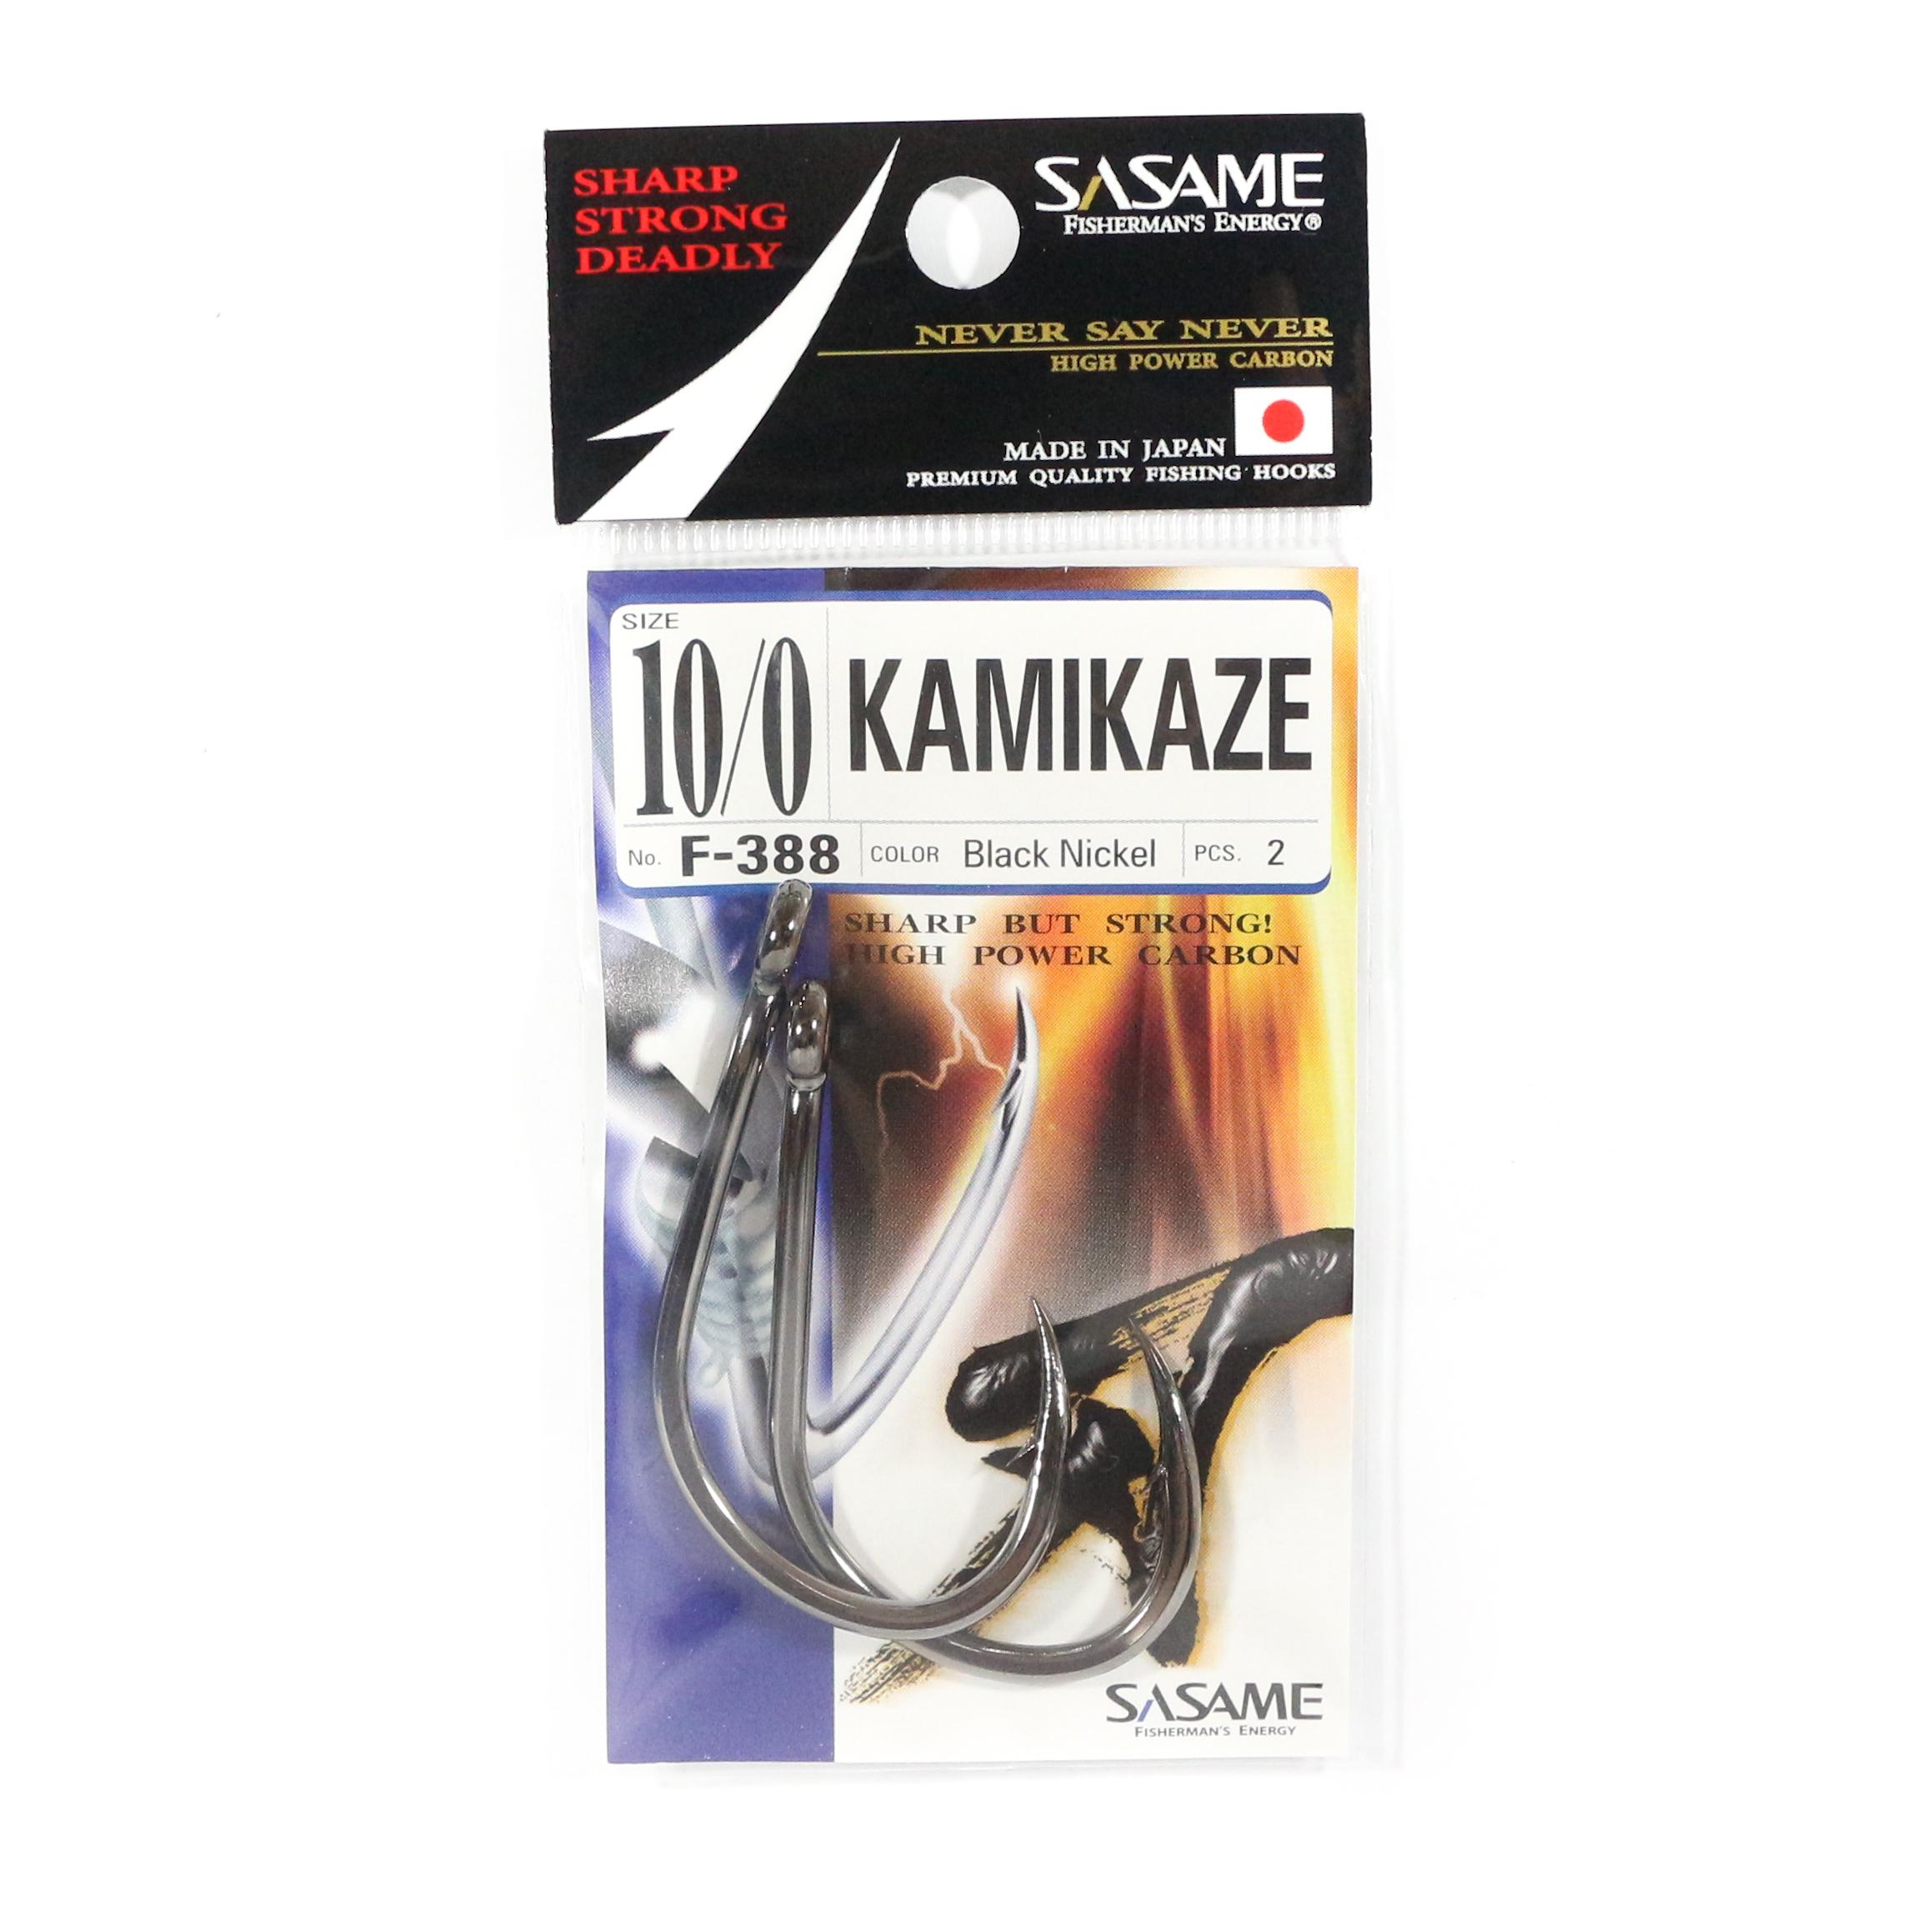 Sasame F-388 Kamikaze Straight Shank Offset Hook Size 10/0 (4781)